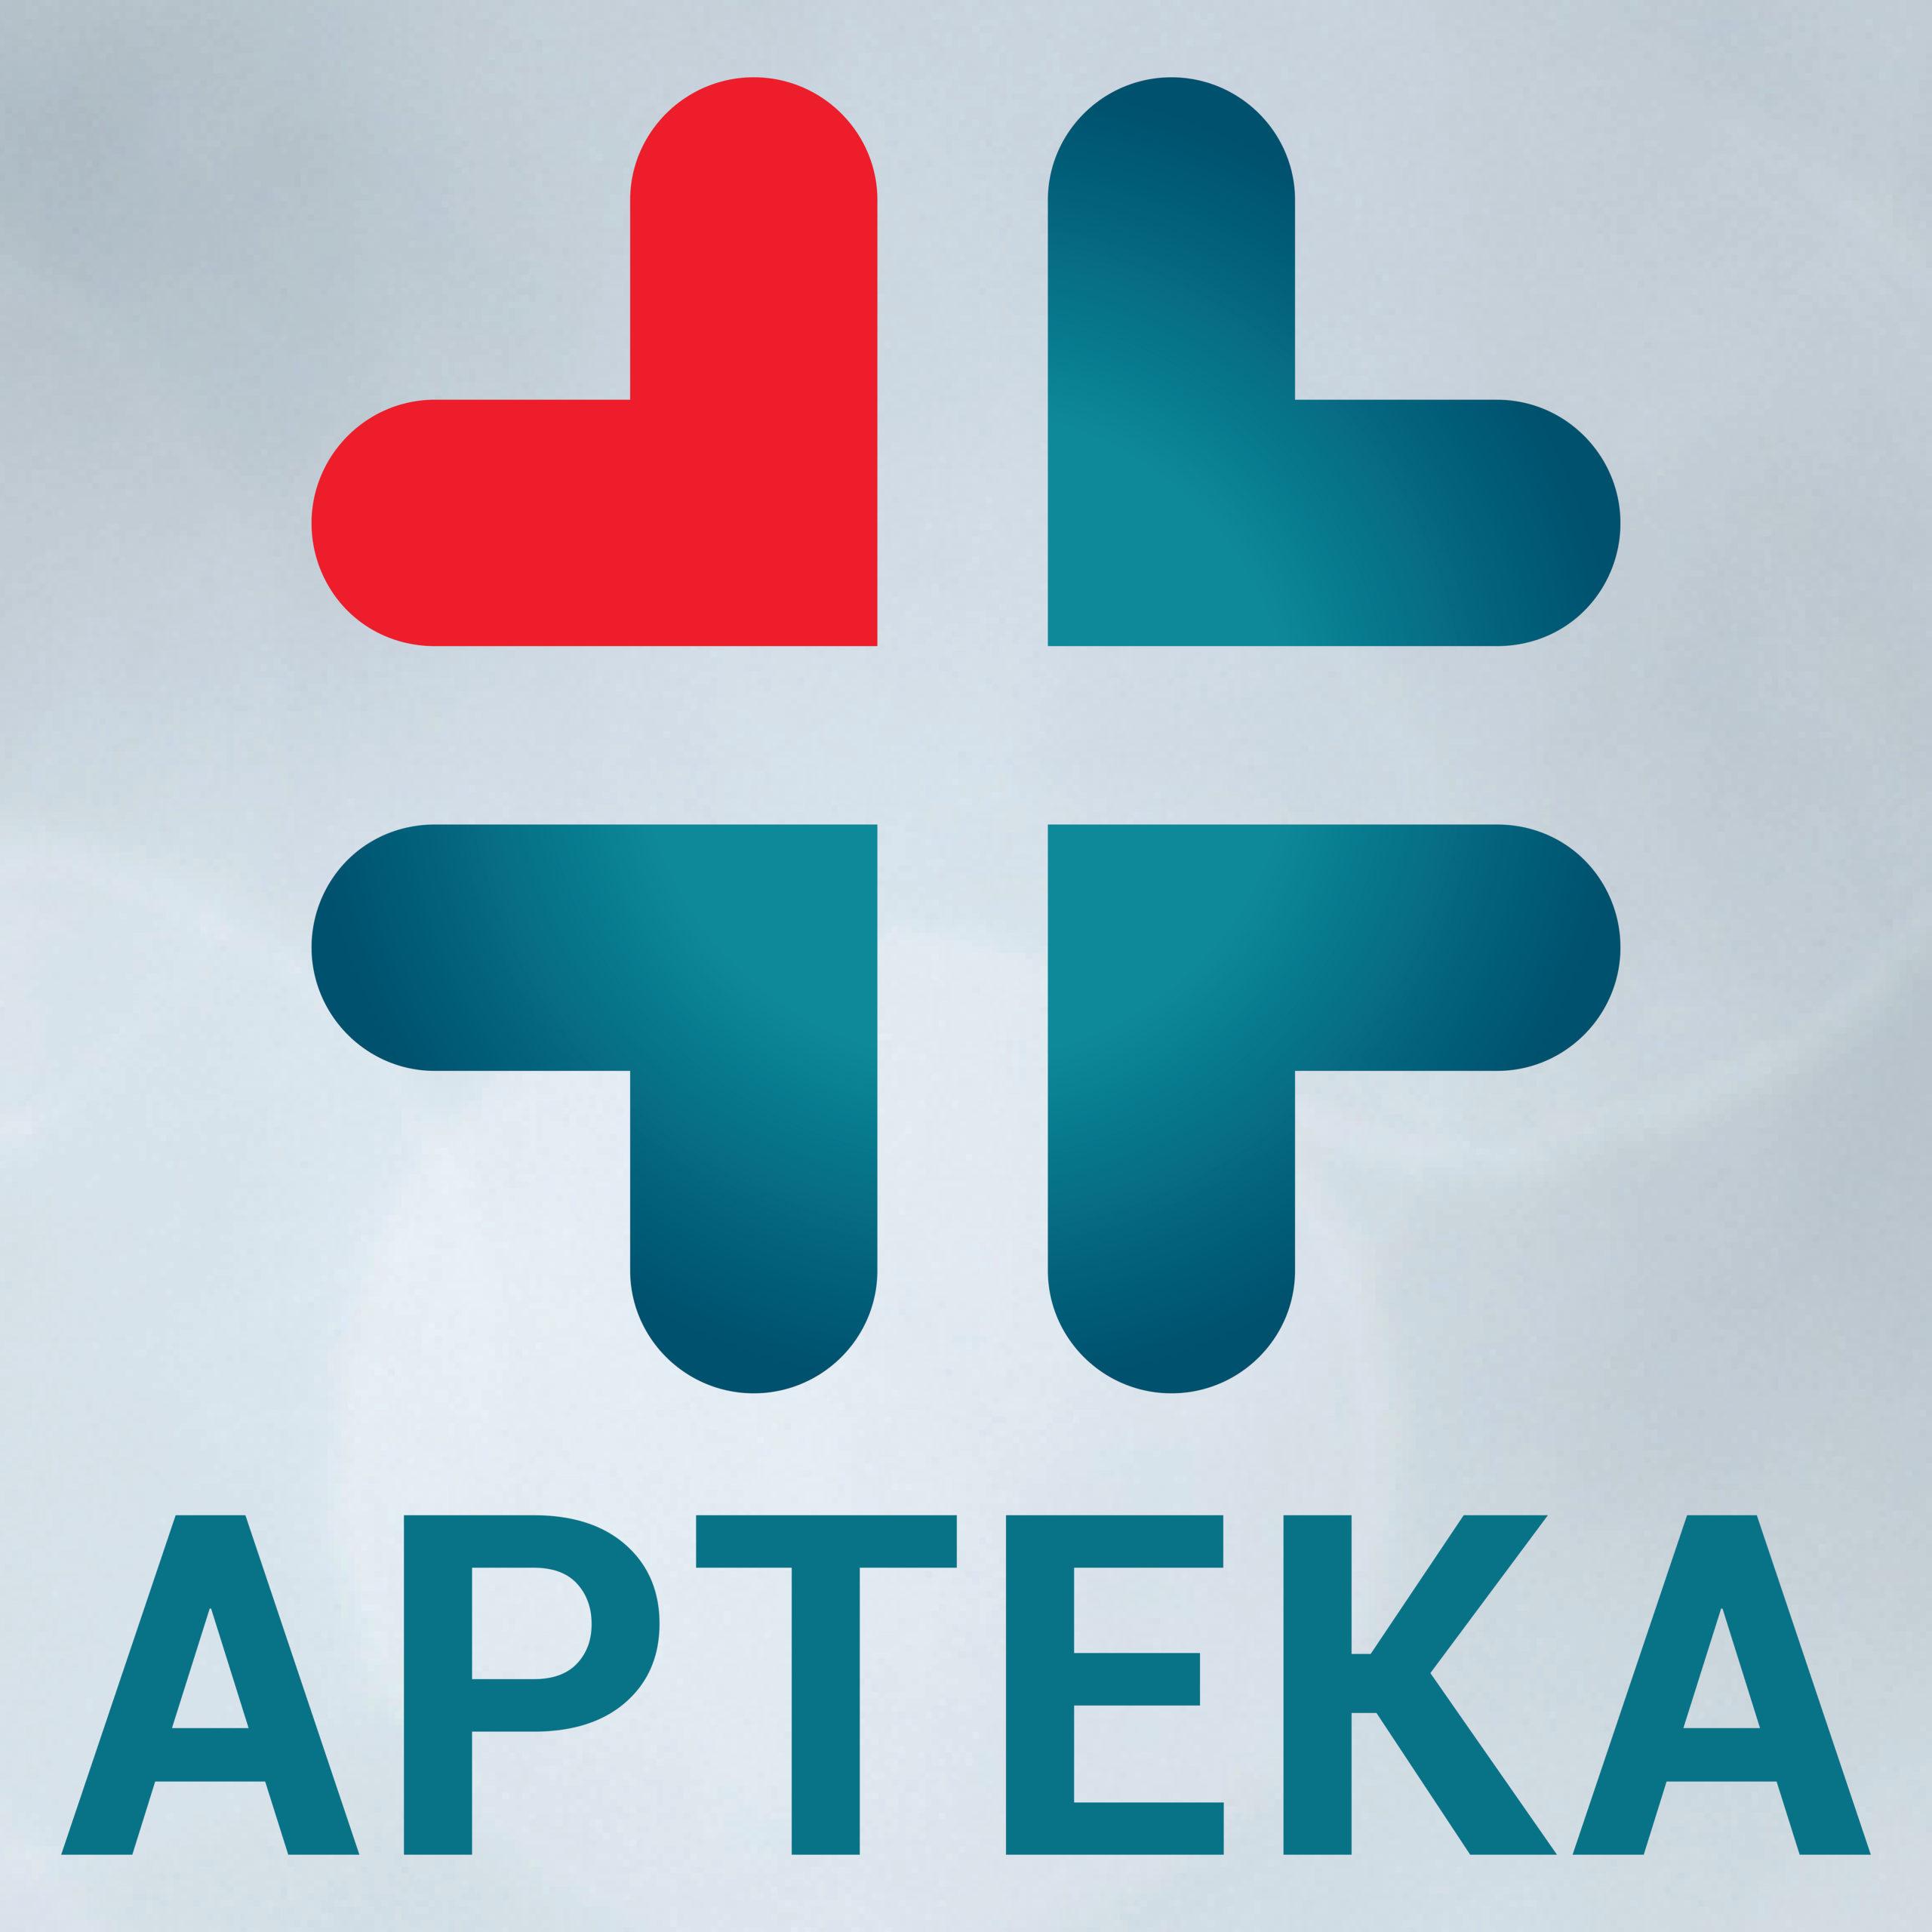 Apteka Warszawa